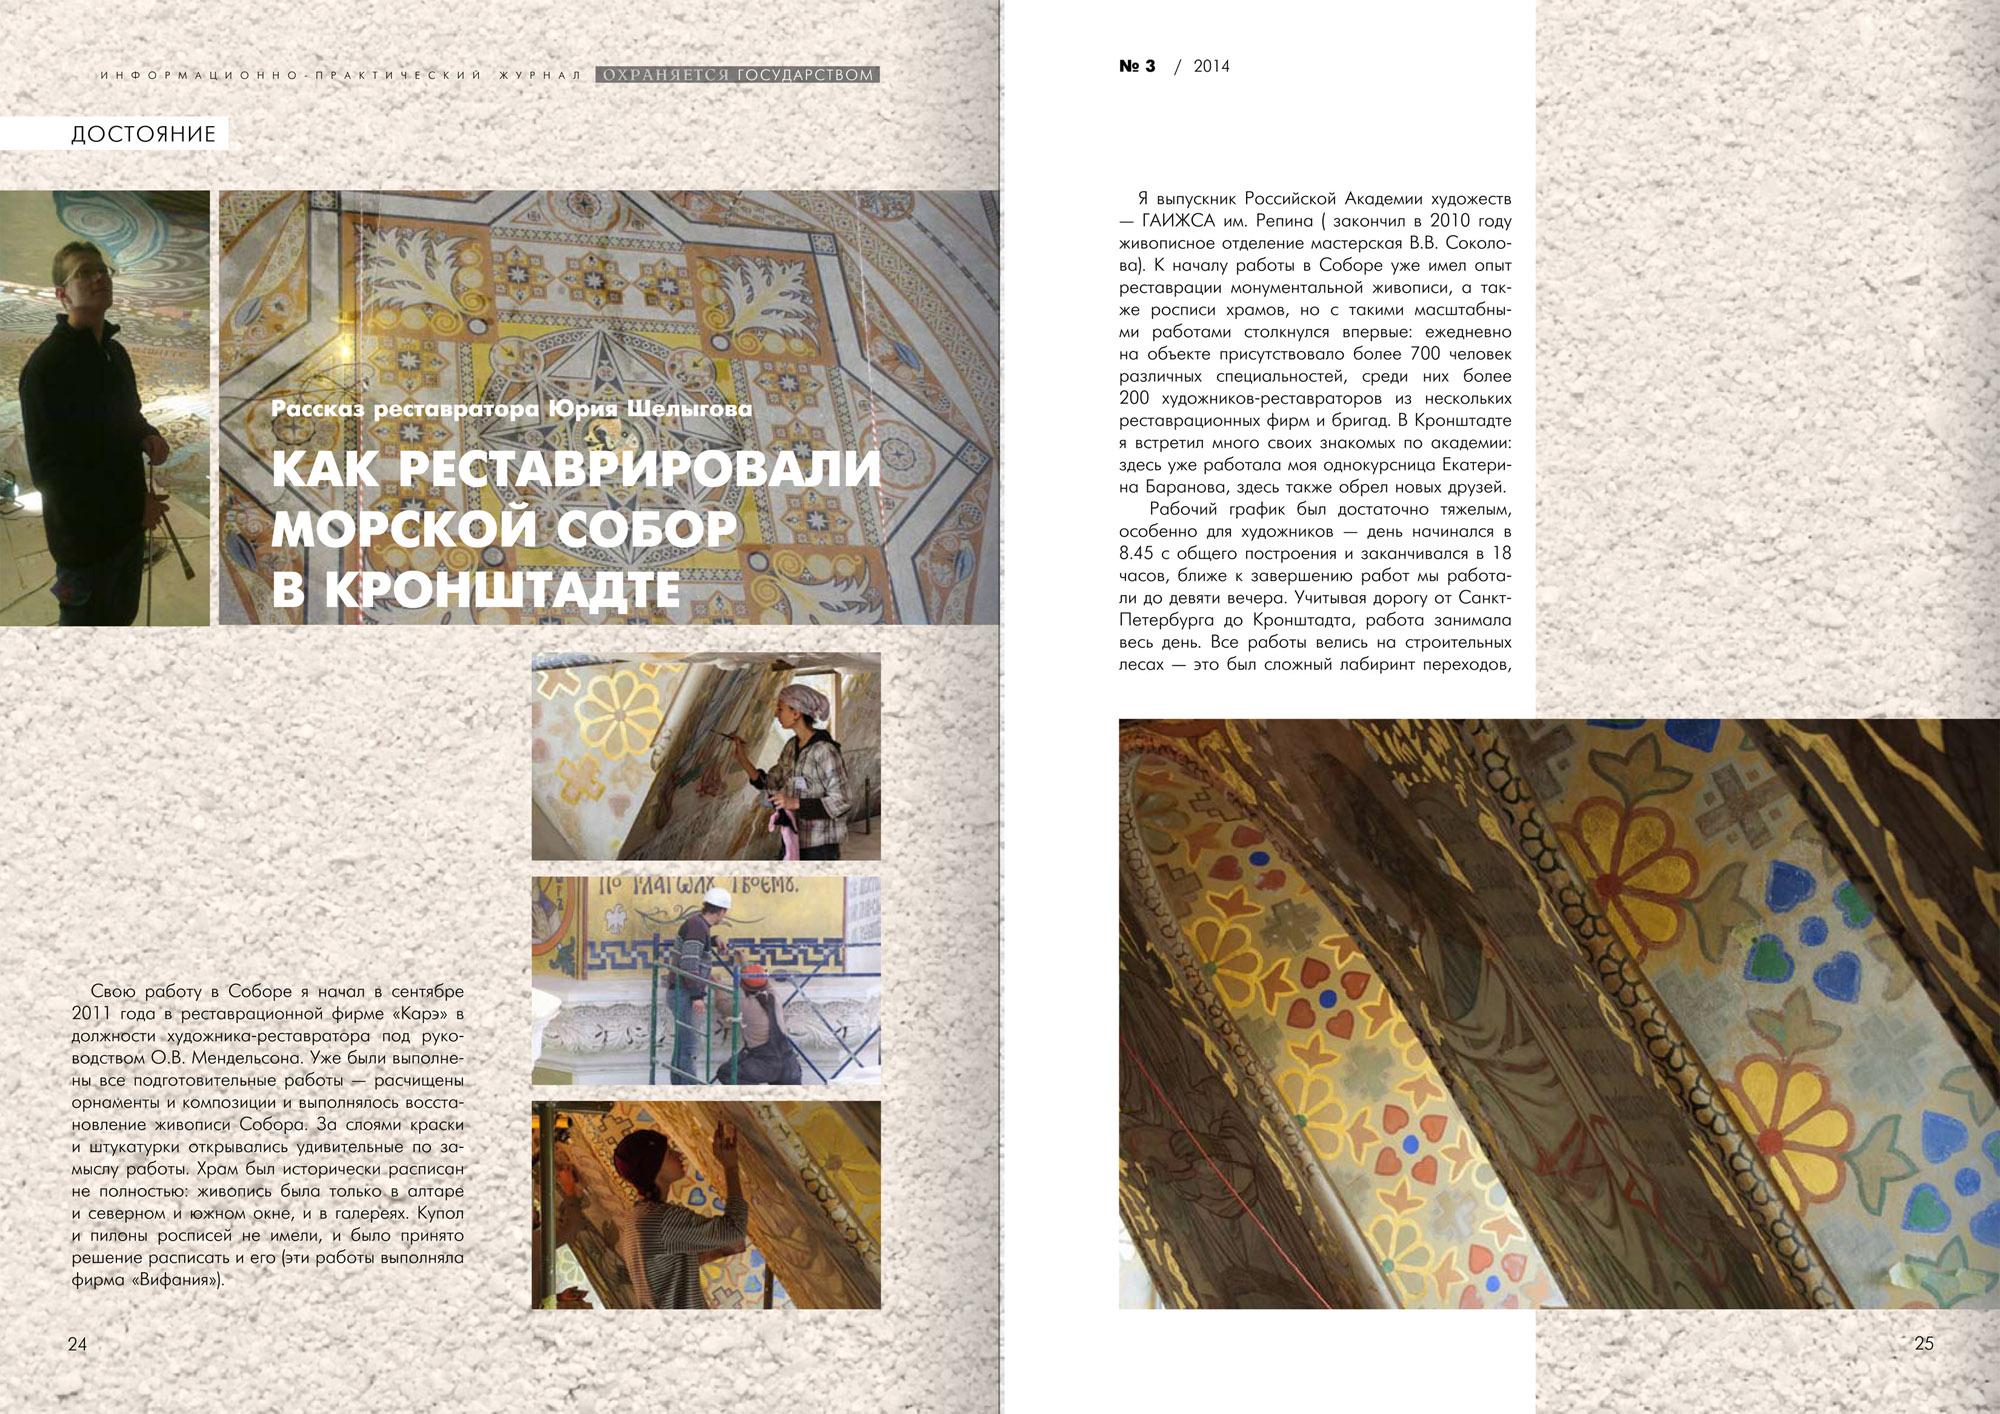 Реставрация Морского собора